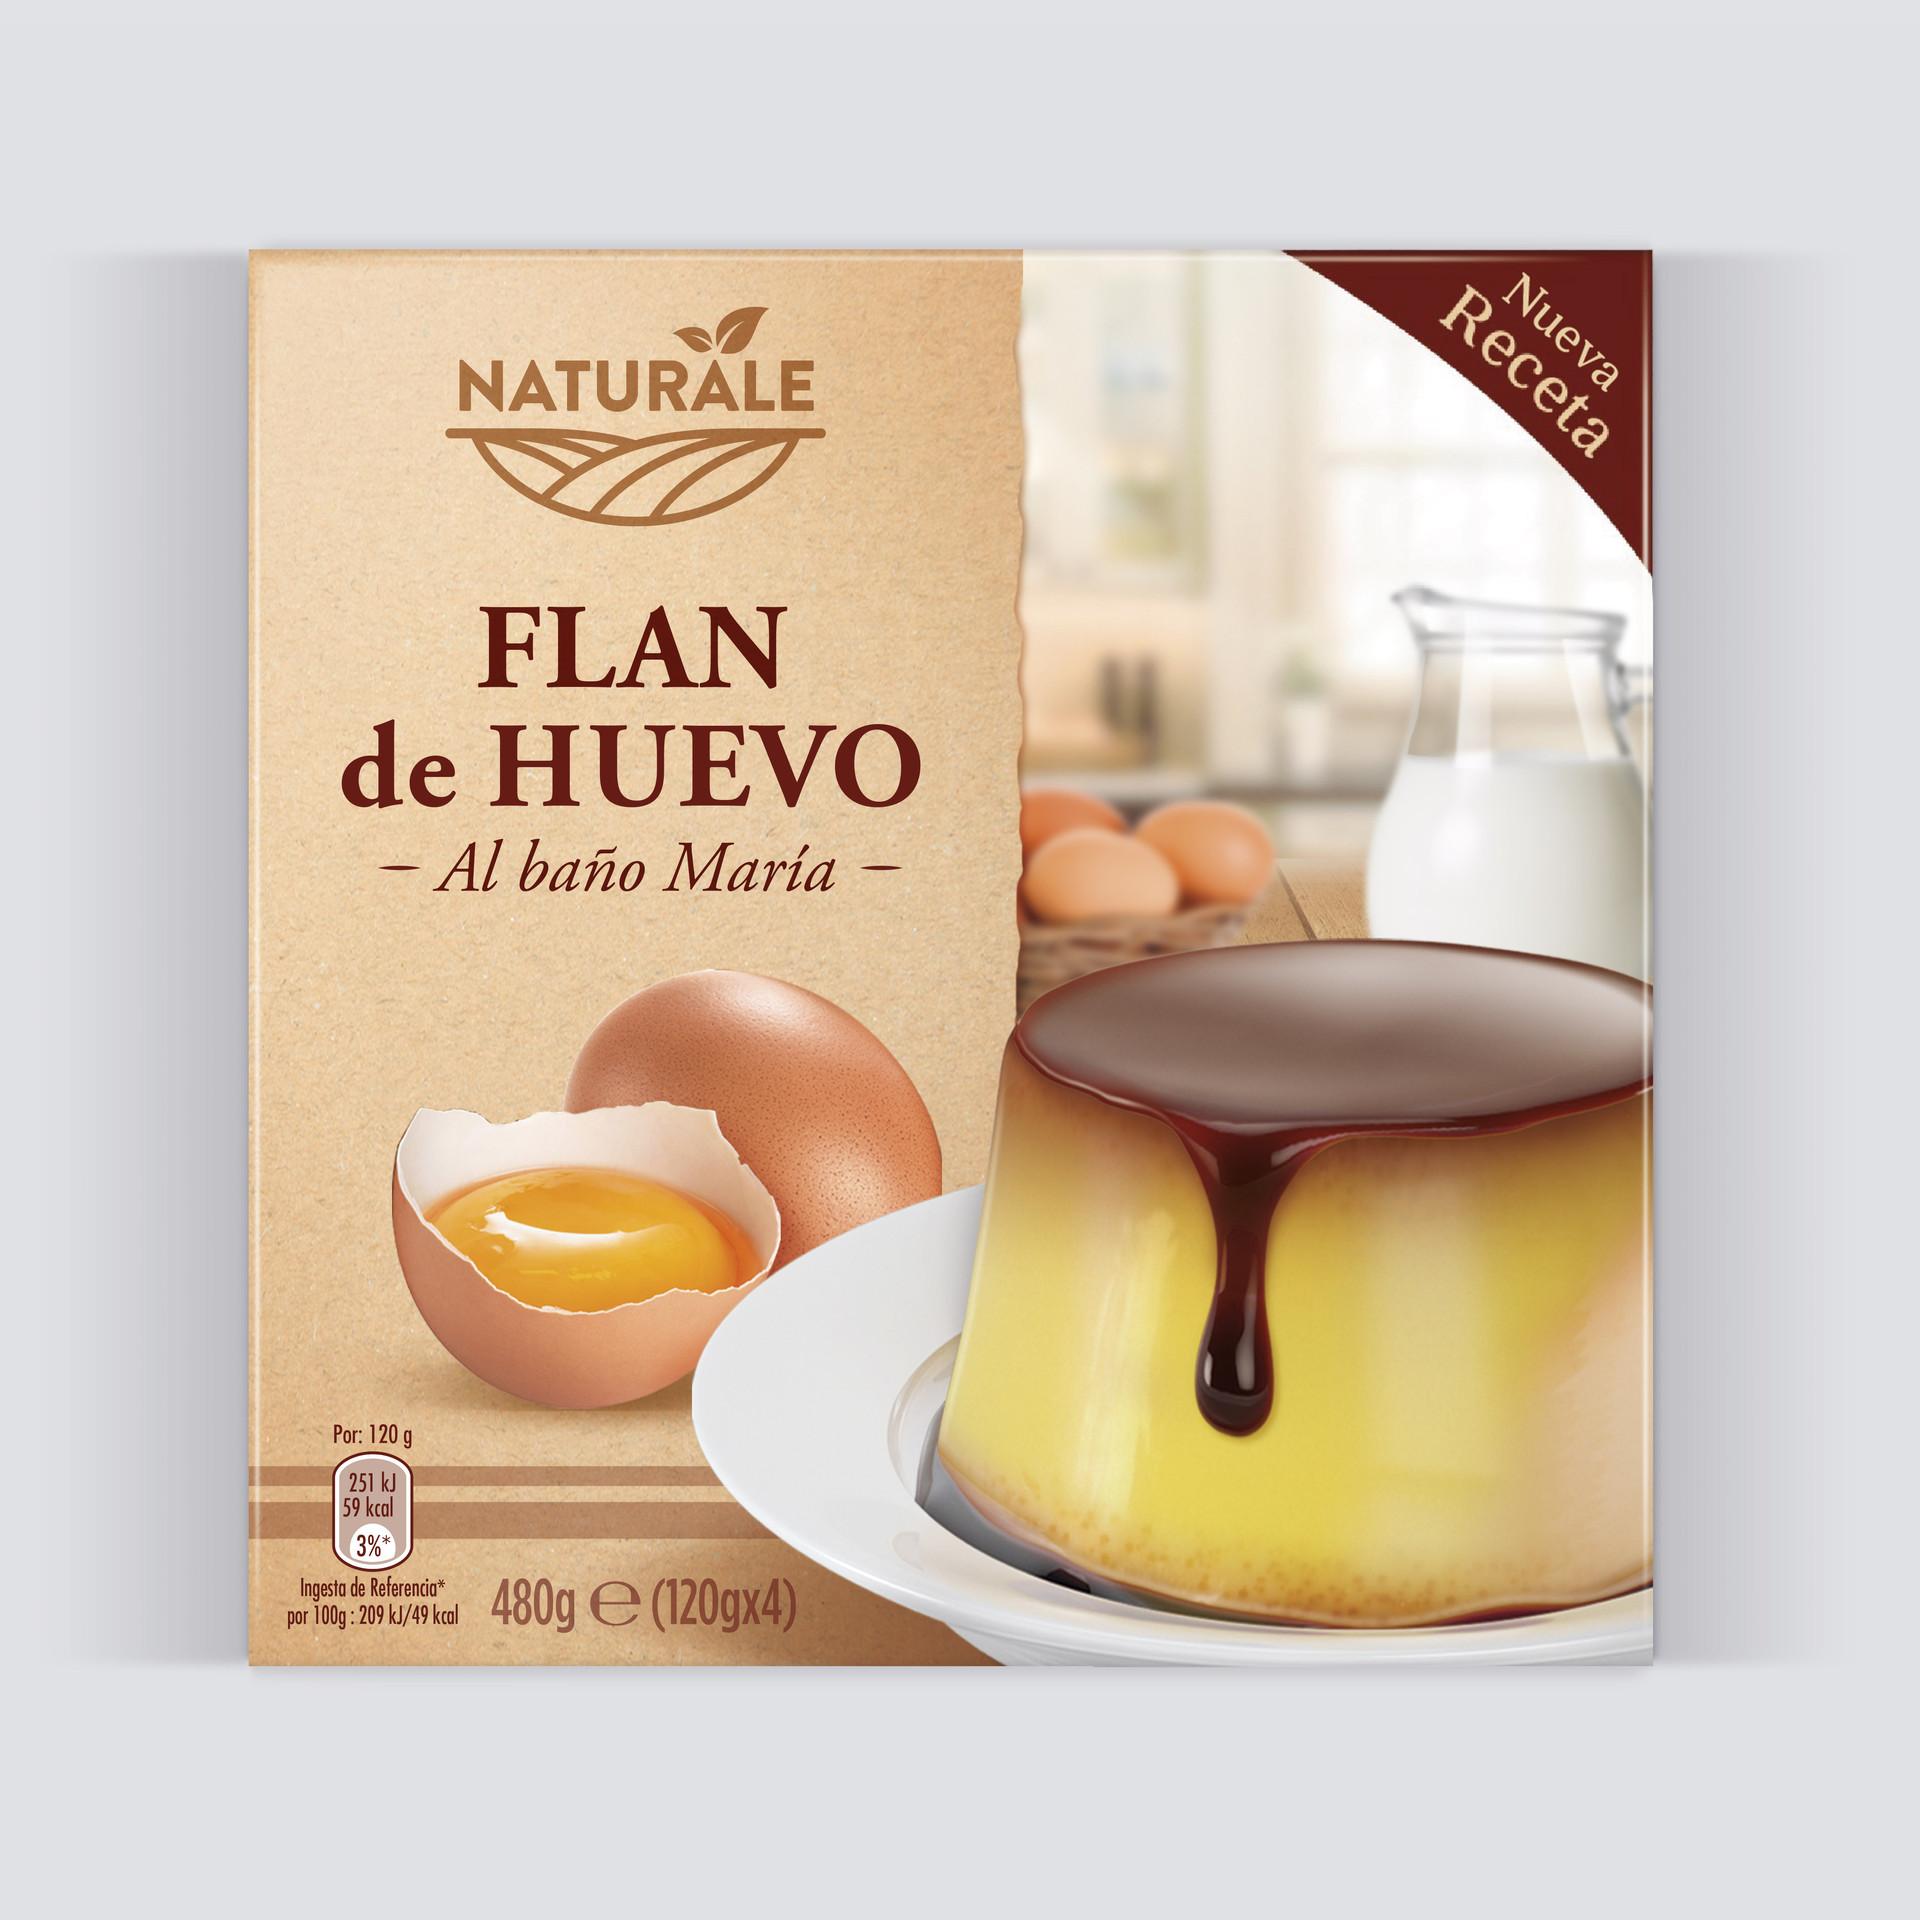 Naturale_Flan_Portada.jpg